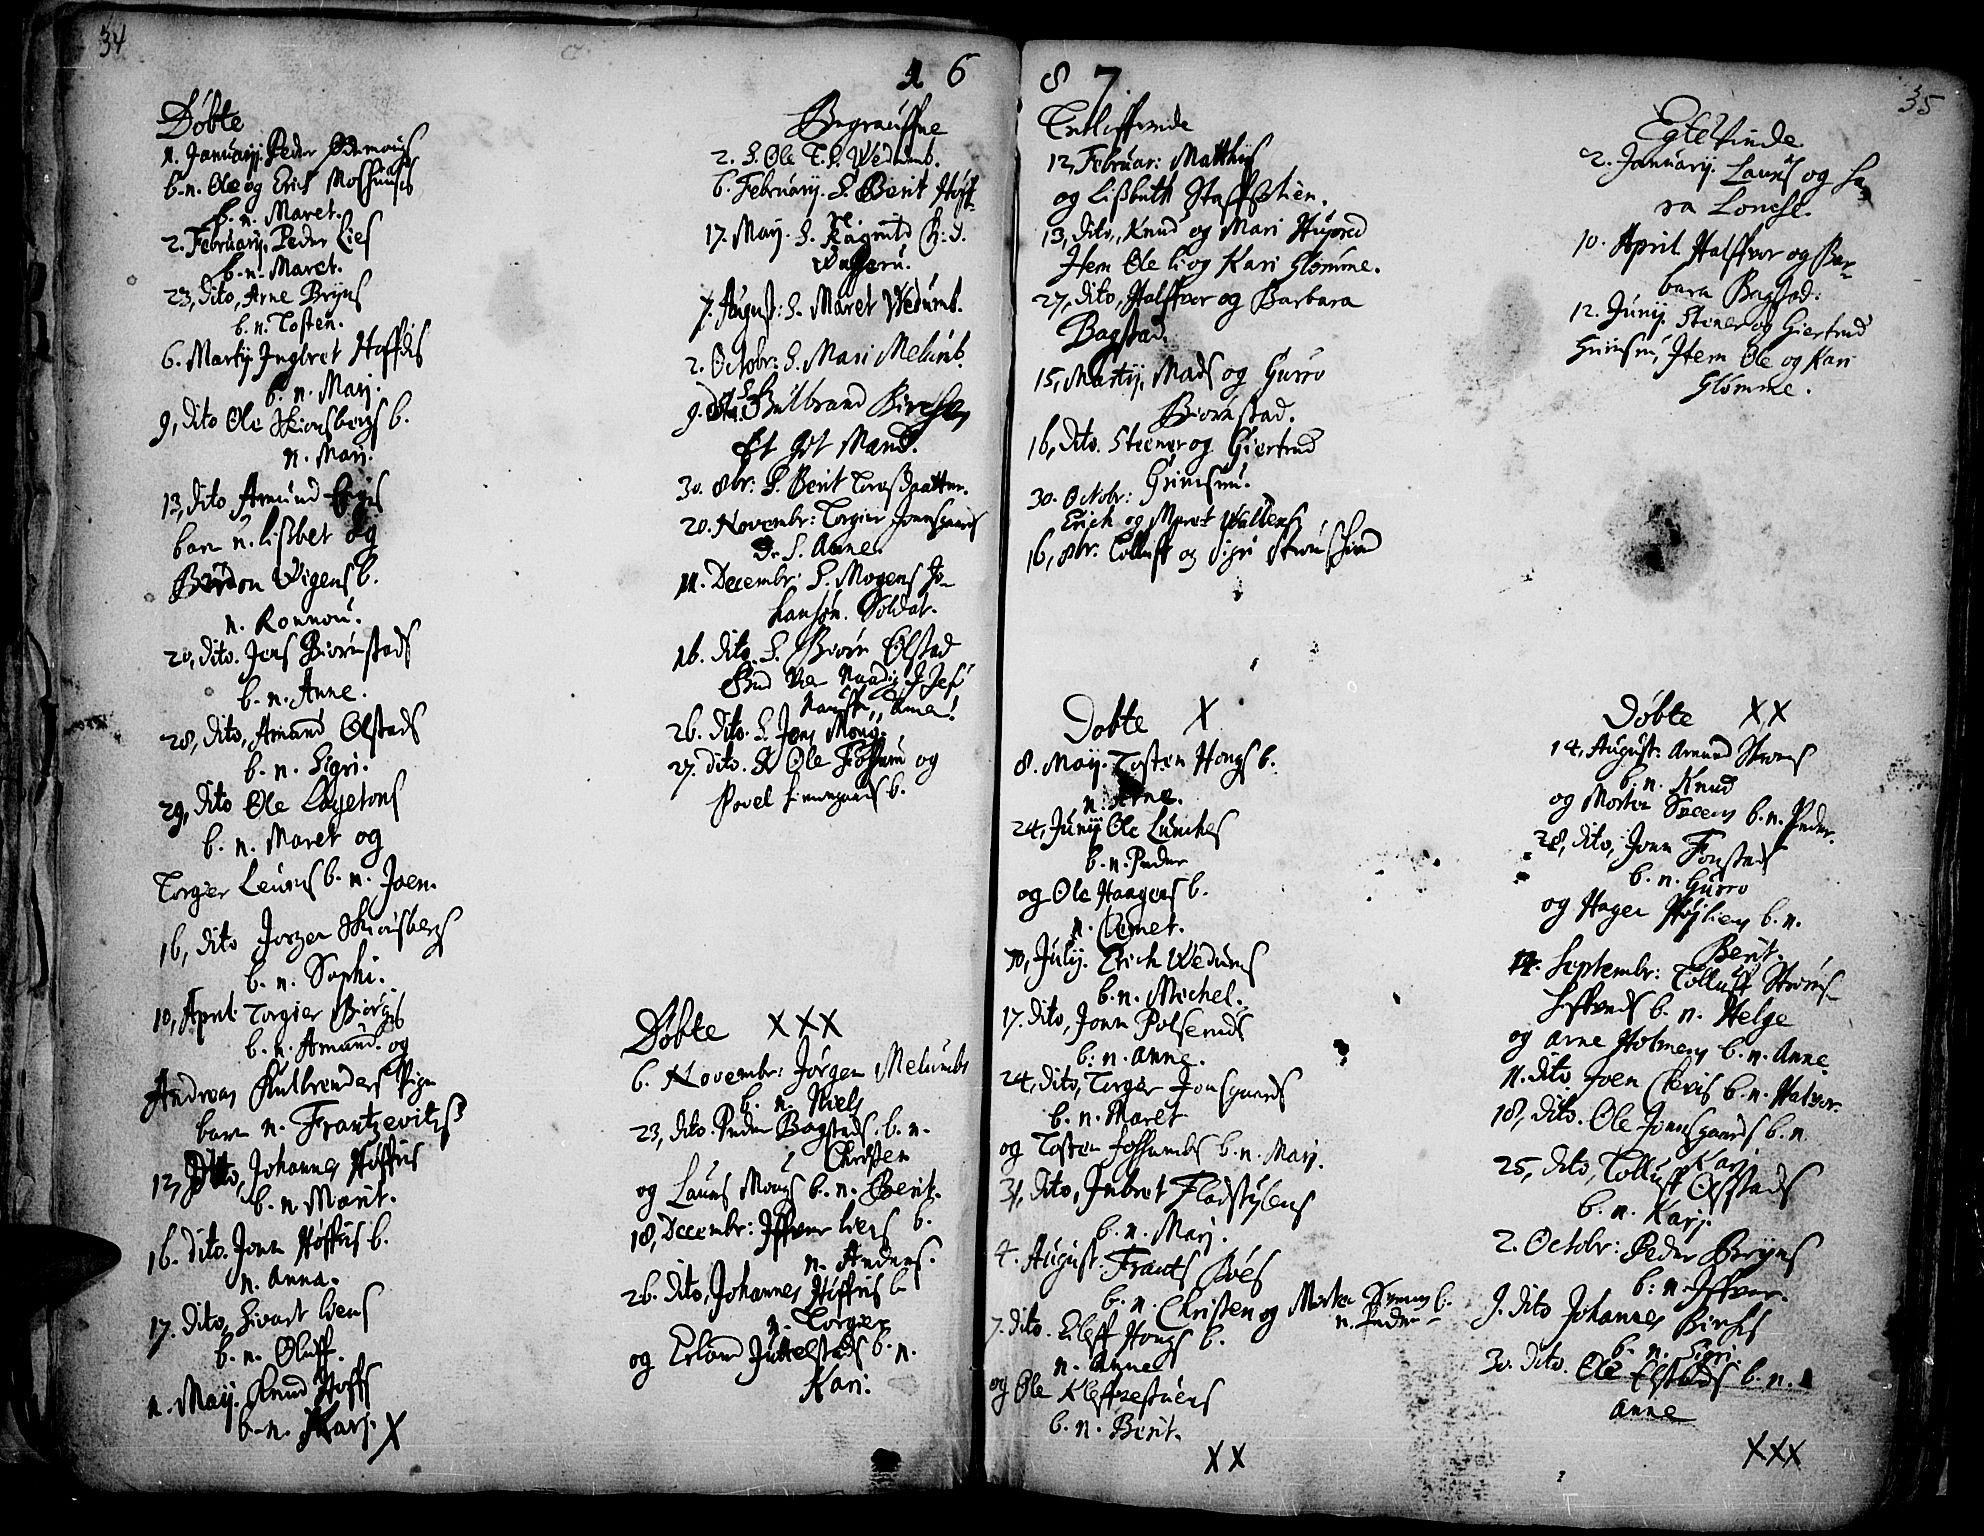 SAH, Øyer prestekontor, Ministerialbok nr. 1, 1671-1727, s. 34-35